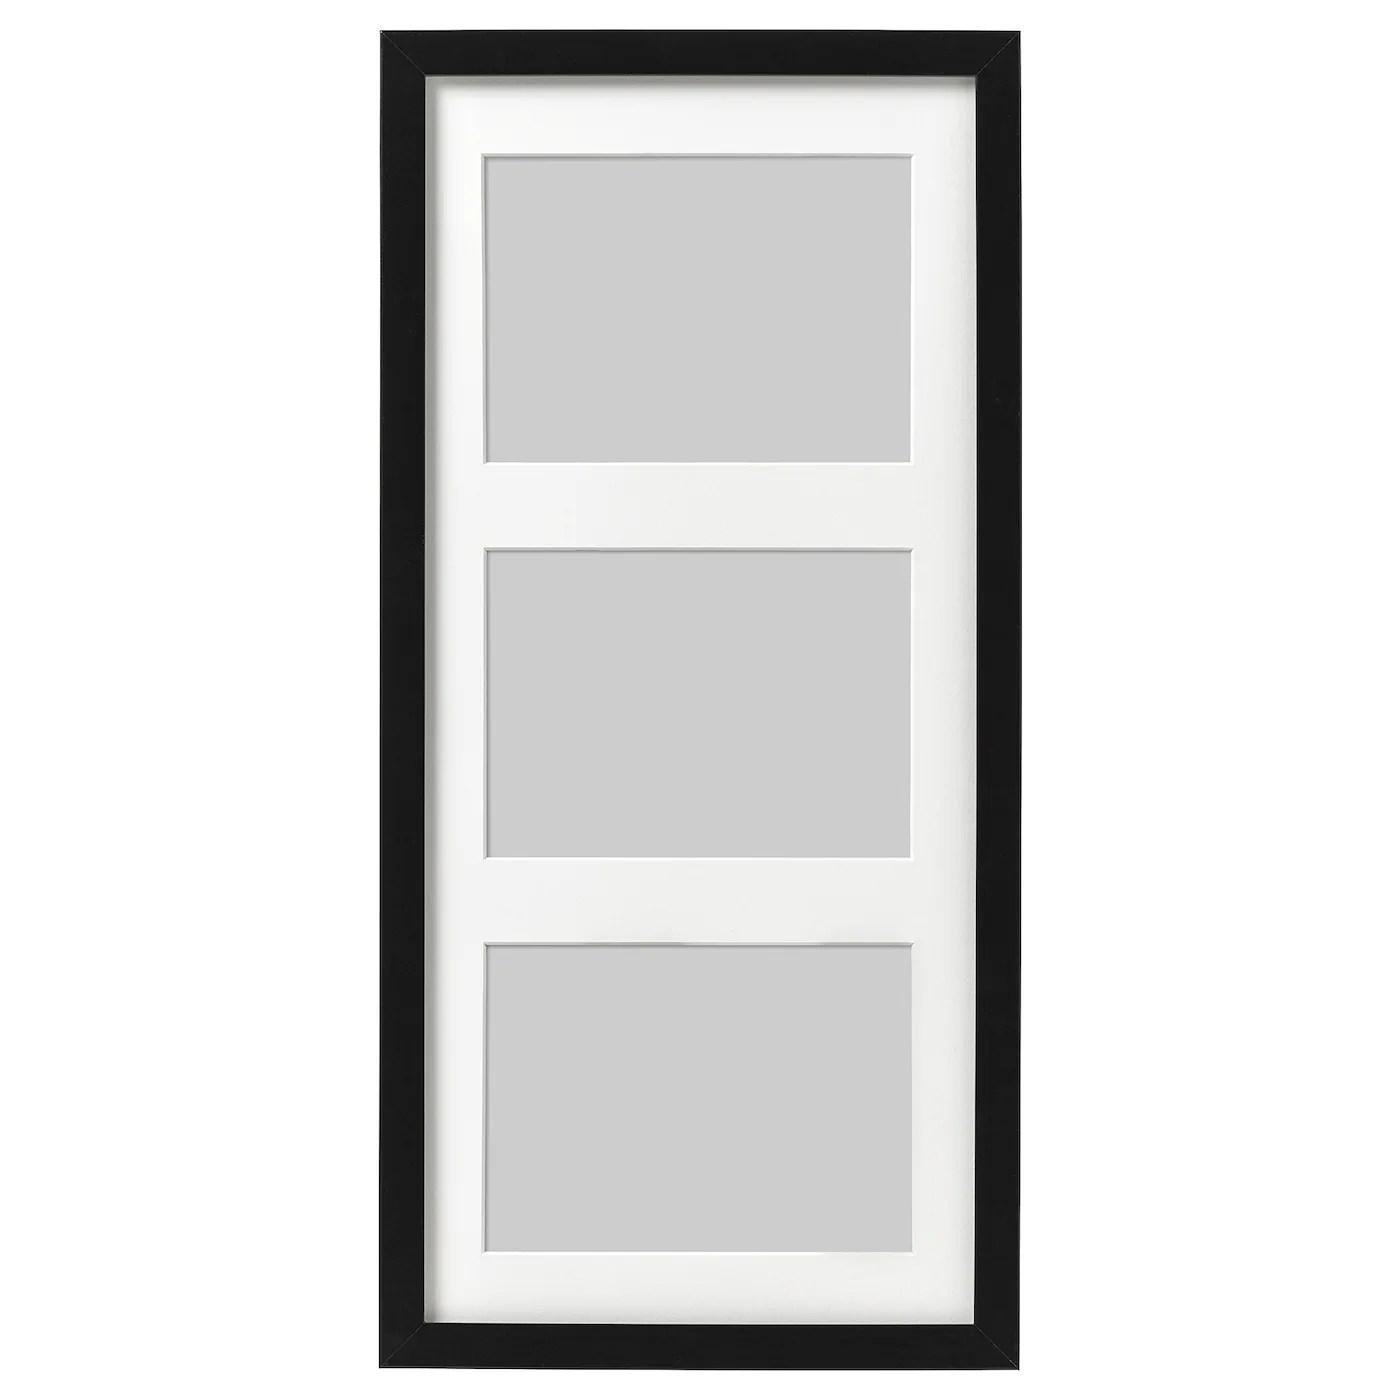 Ribba Cadre Noir 50x23 Cm Ikea